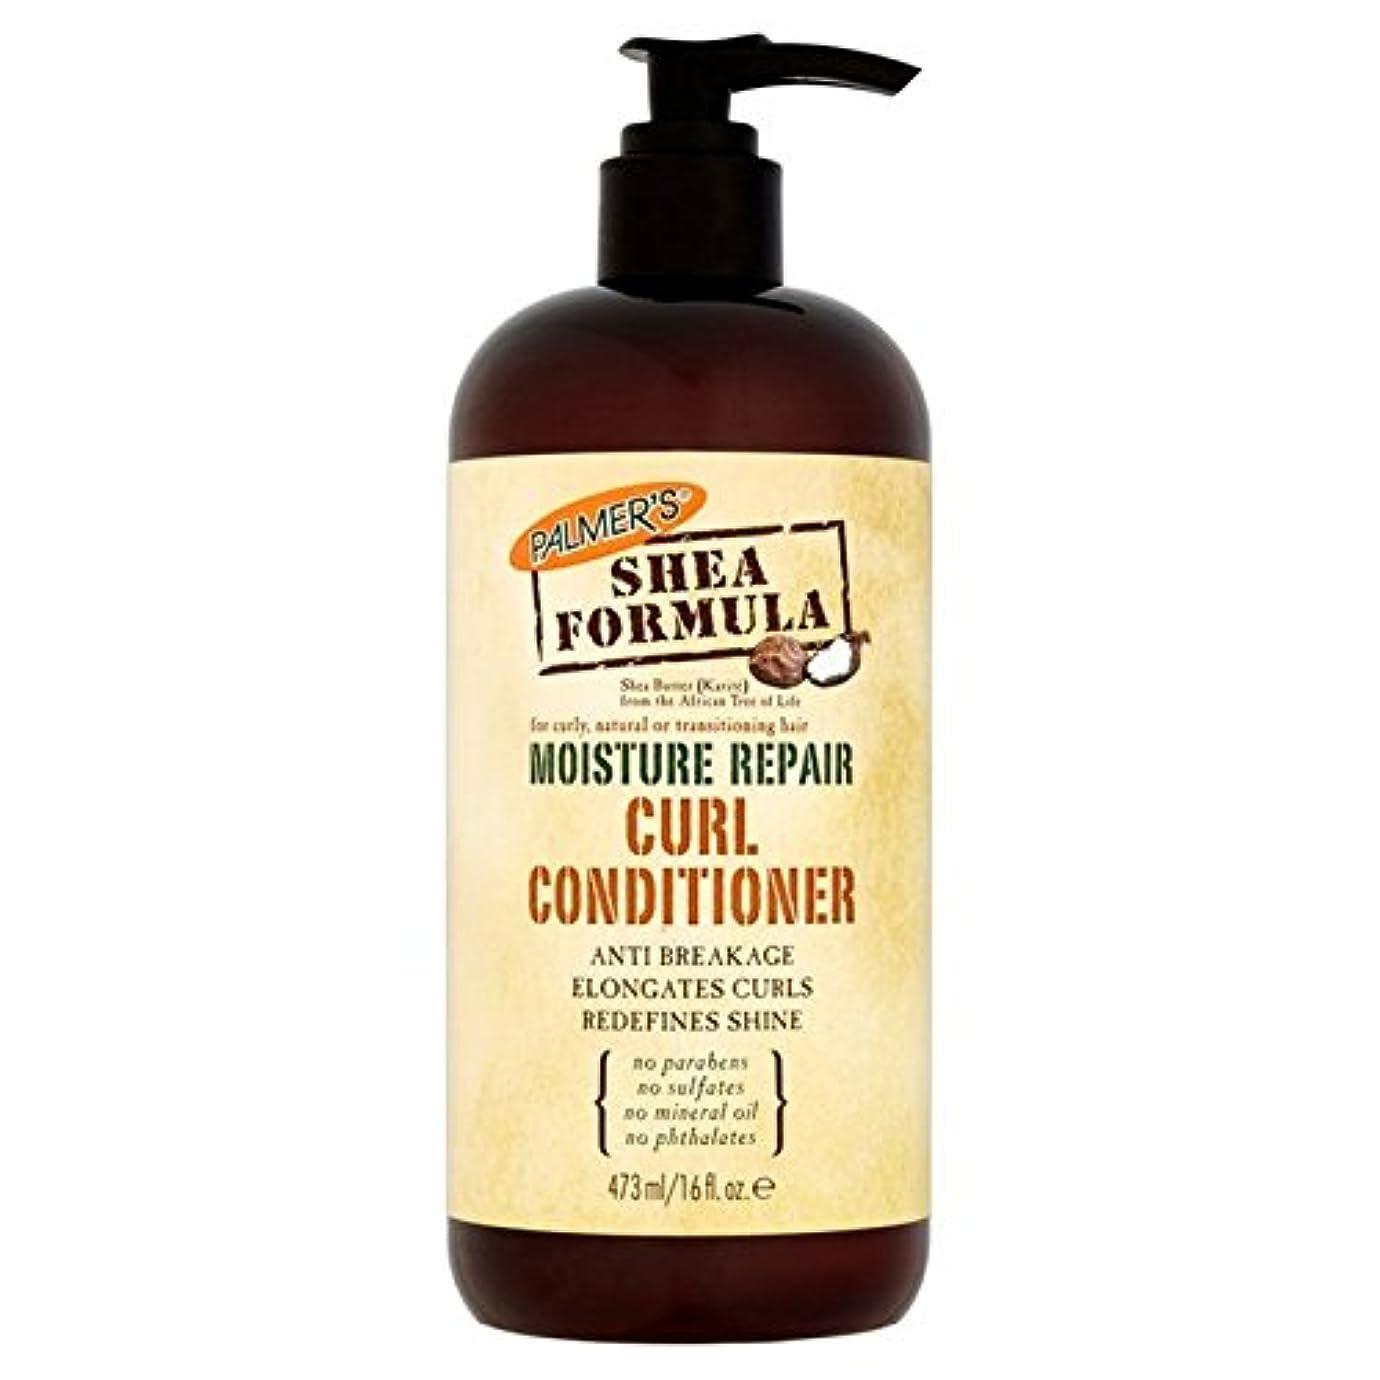 Palmer's Shea Formula Moisture Repair Curl Conditioner 473ml - パーマーのシア式水分修理カールコンディショナー473ミリリットル [並行輸入品]